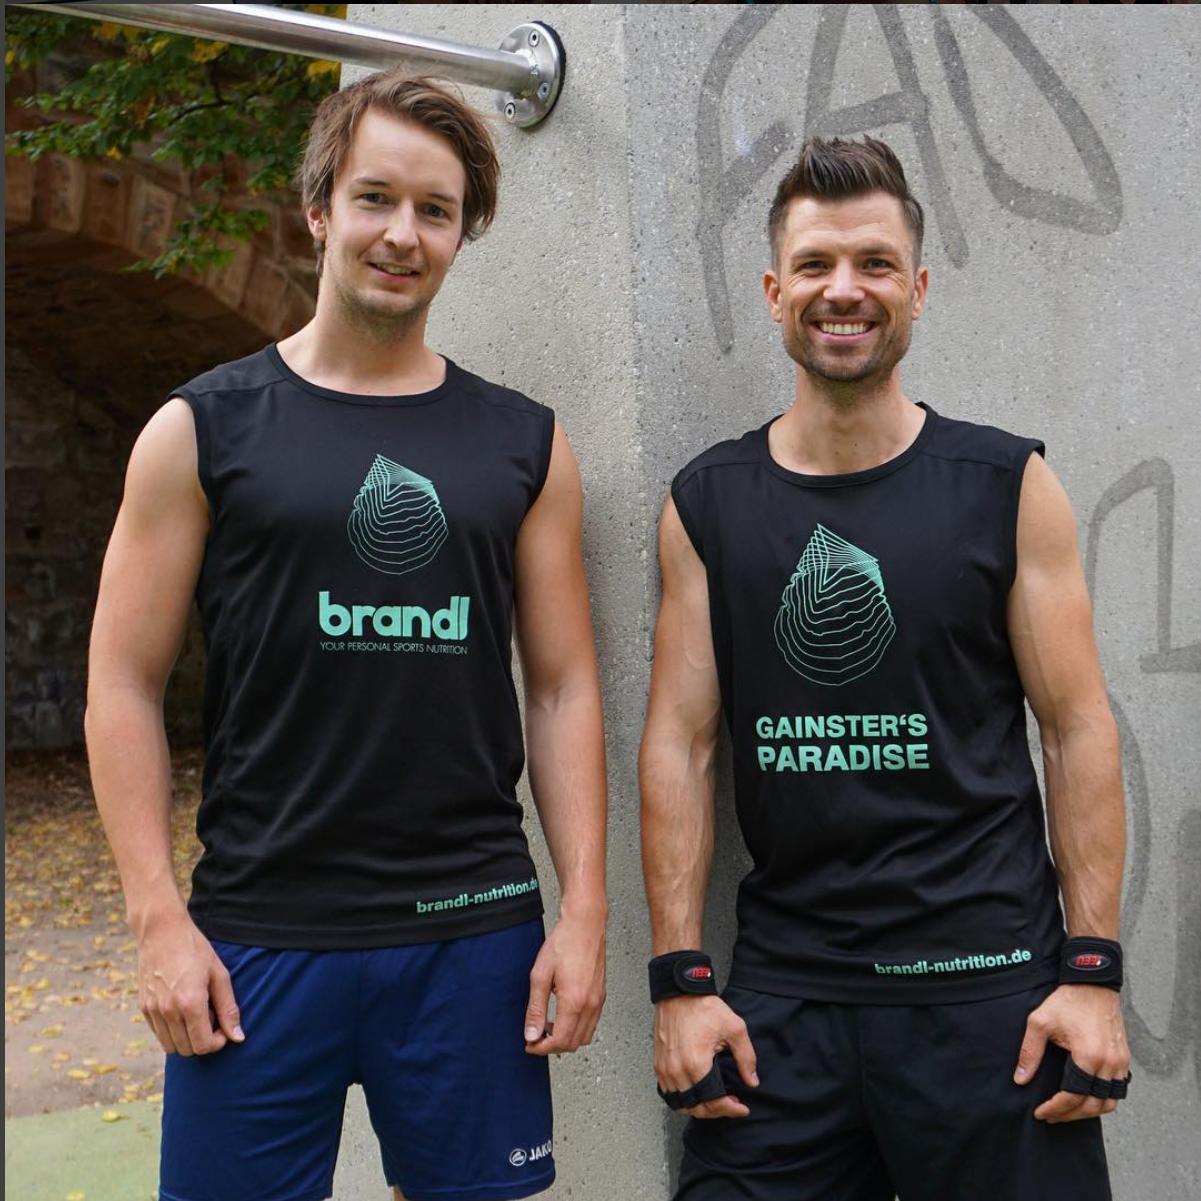 Brandl Gründer mit Branding Shirt